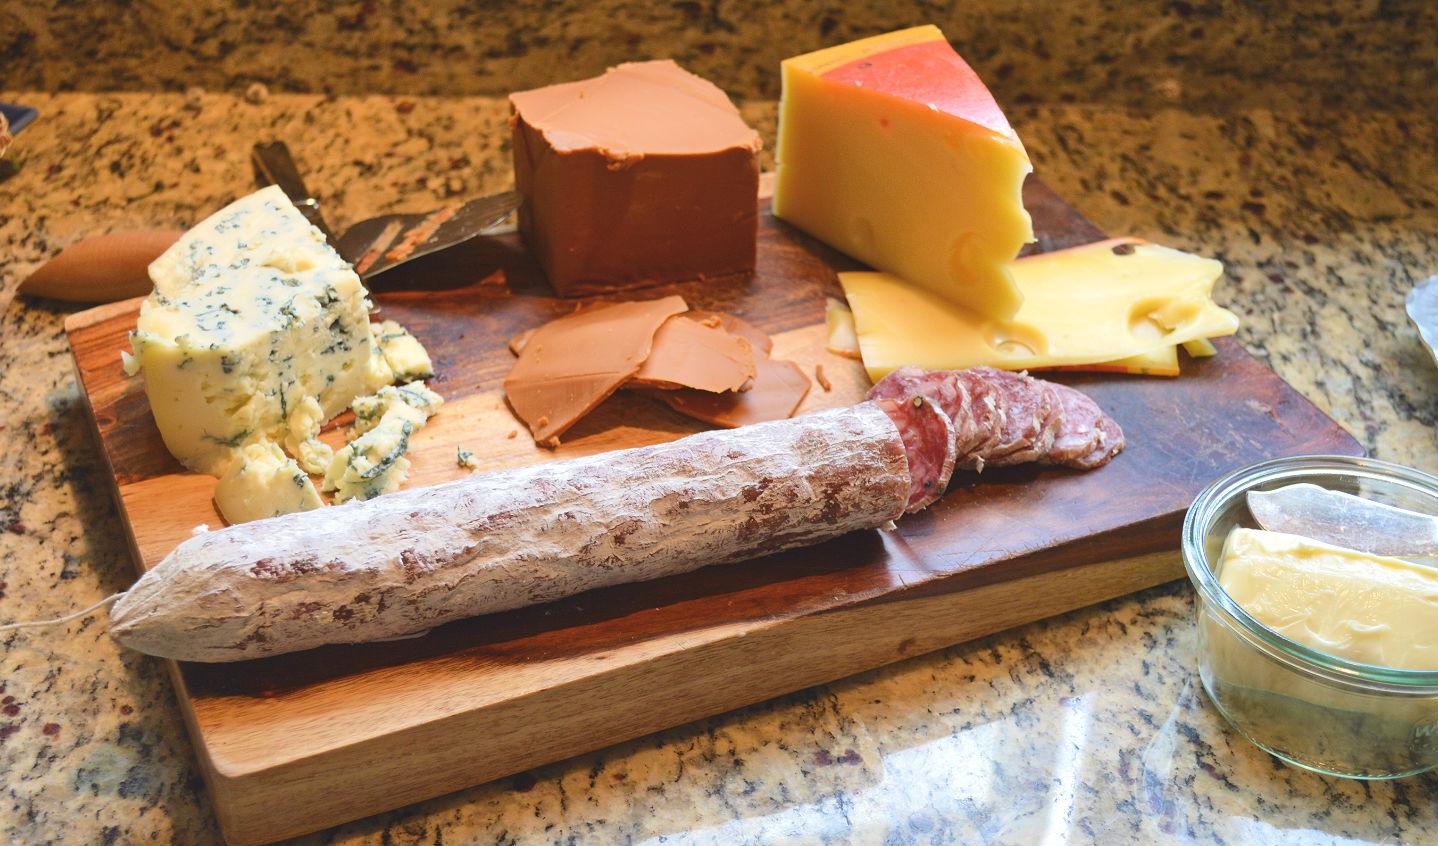 Bleu, Gjetost, and Jarlsberg cheeses, with Sausage Soppressata